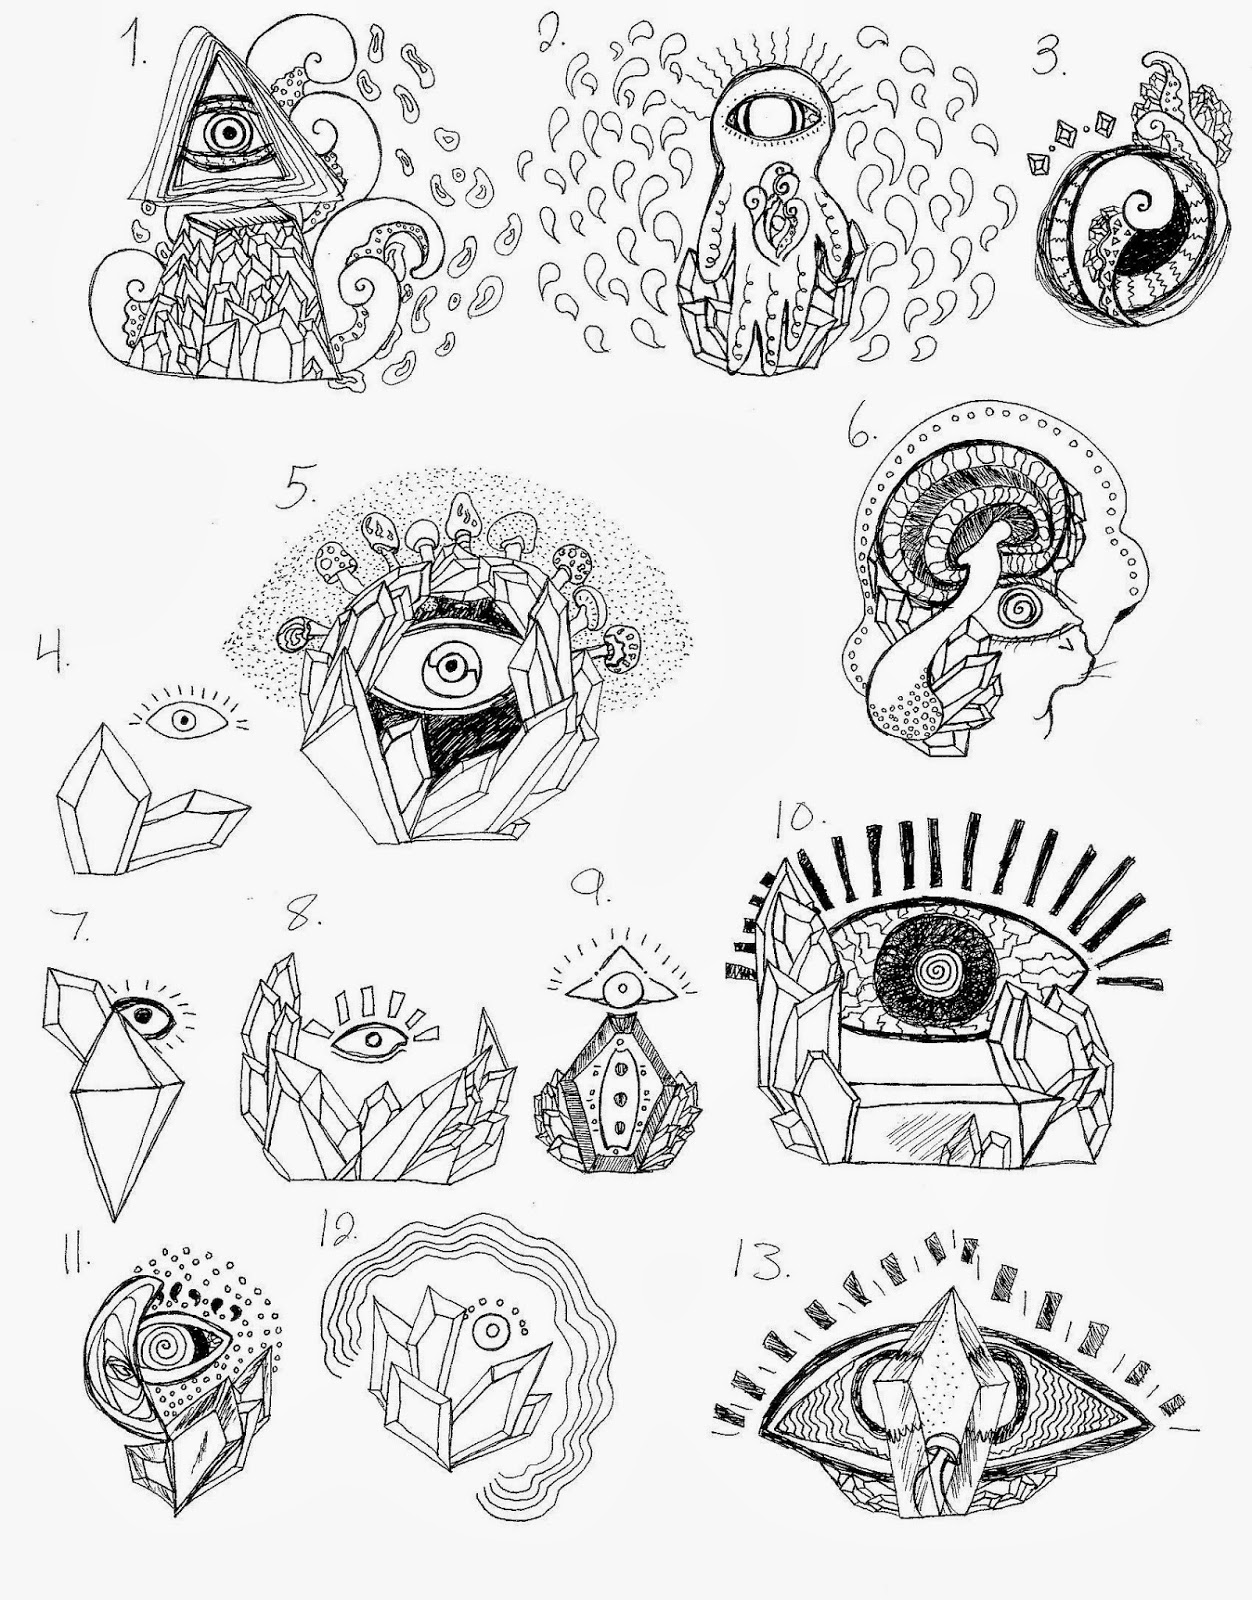 Illuminati Tattoos Designs I am currently working on